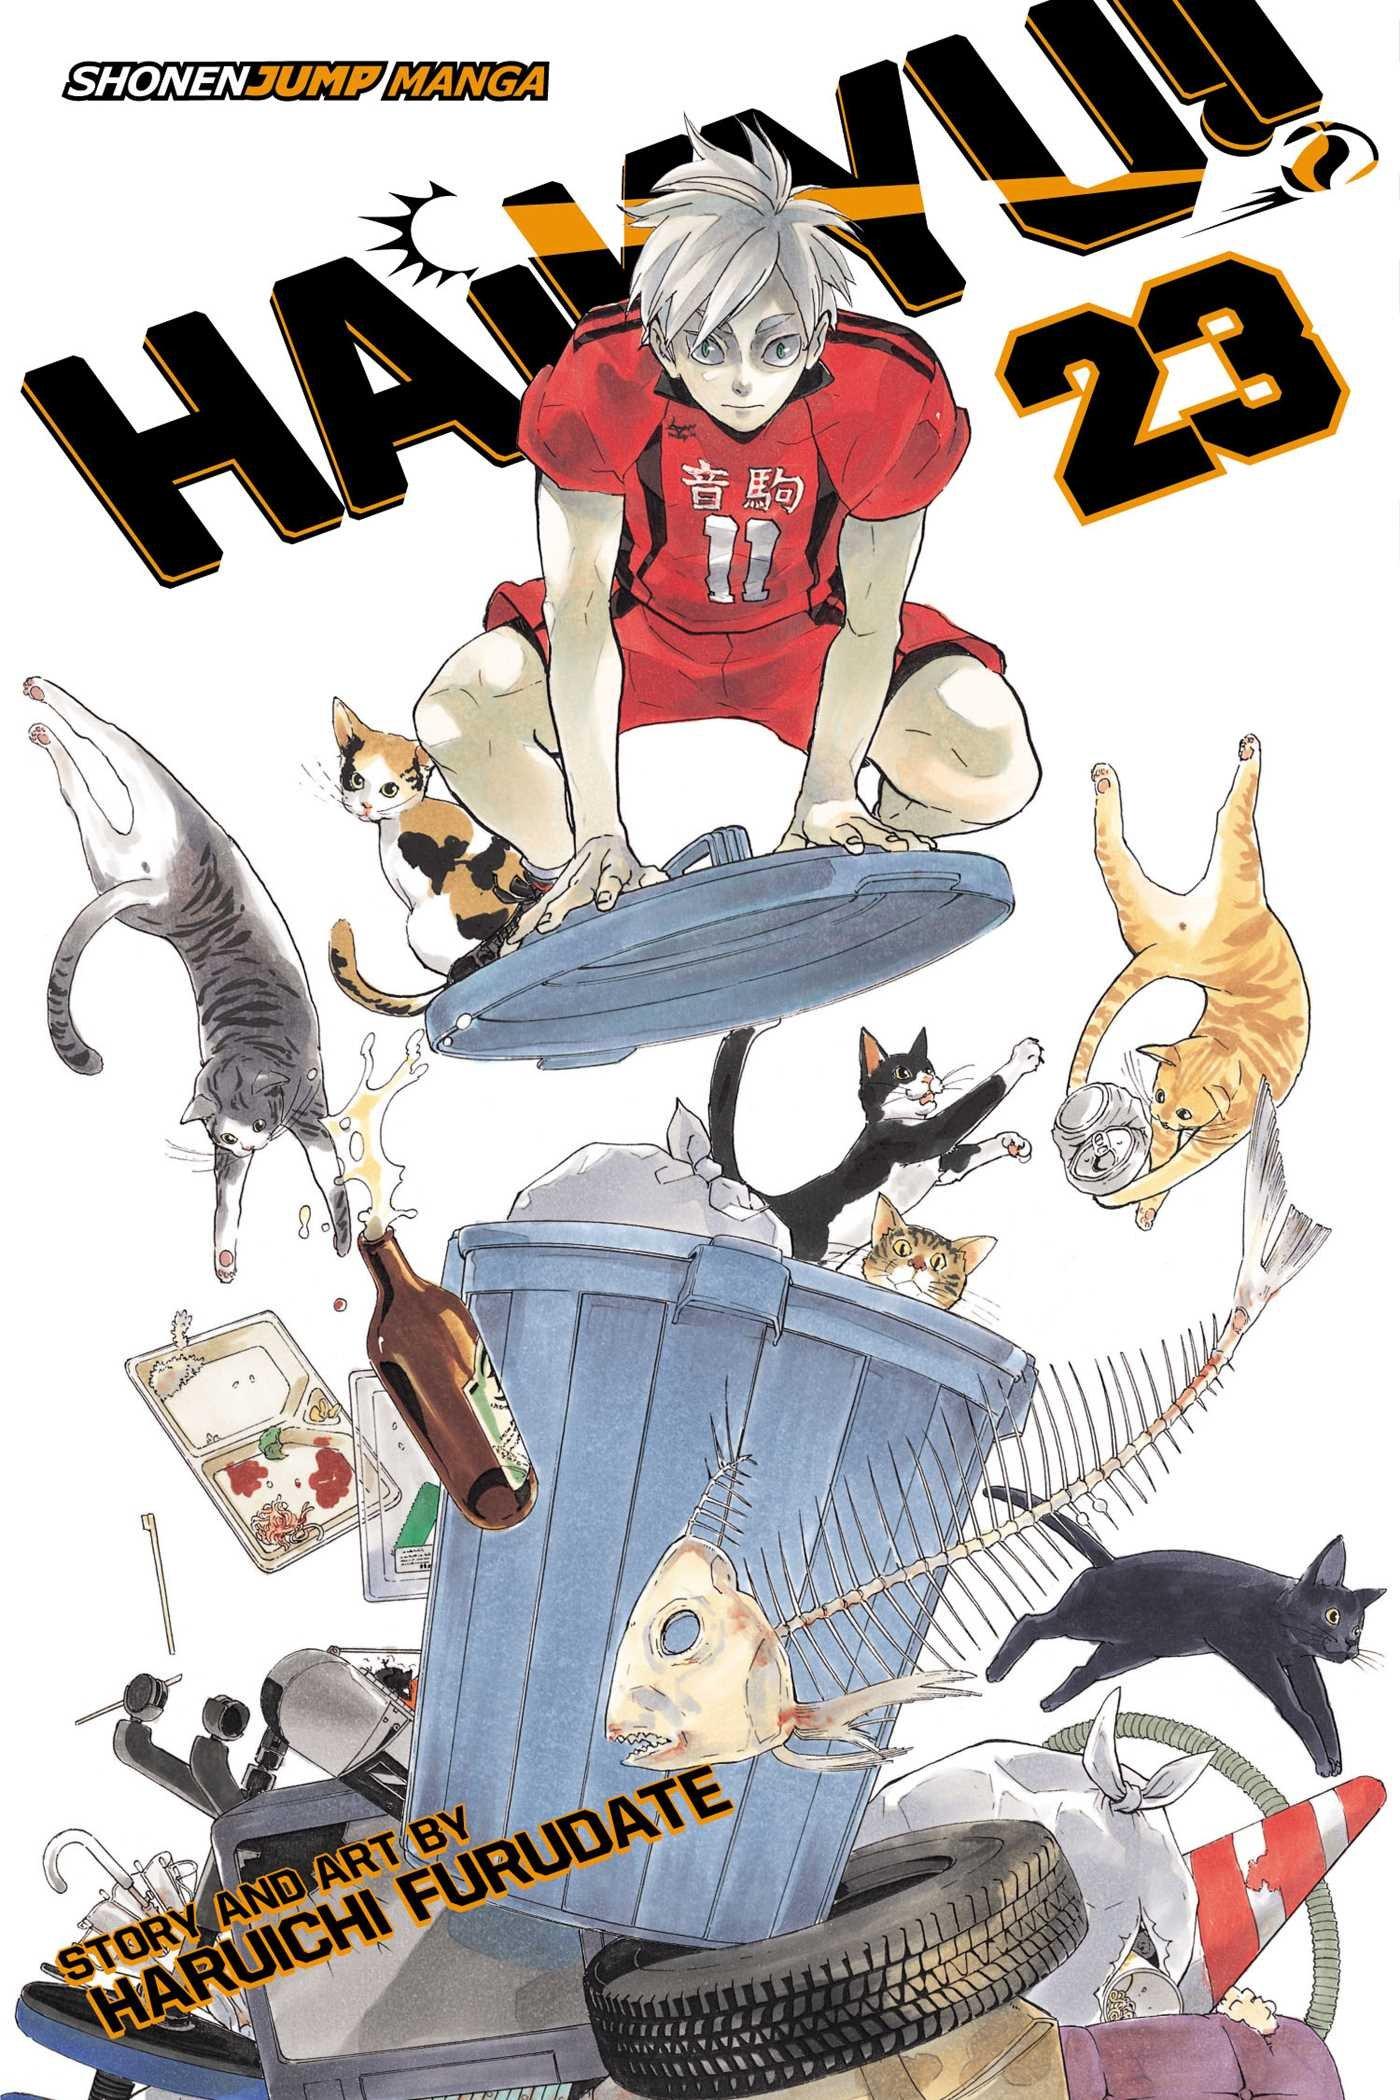 Haikyu!! - Tomo 23 - Haruichi Furudate - Manga ( Ingles)